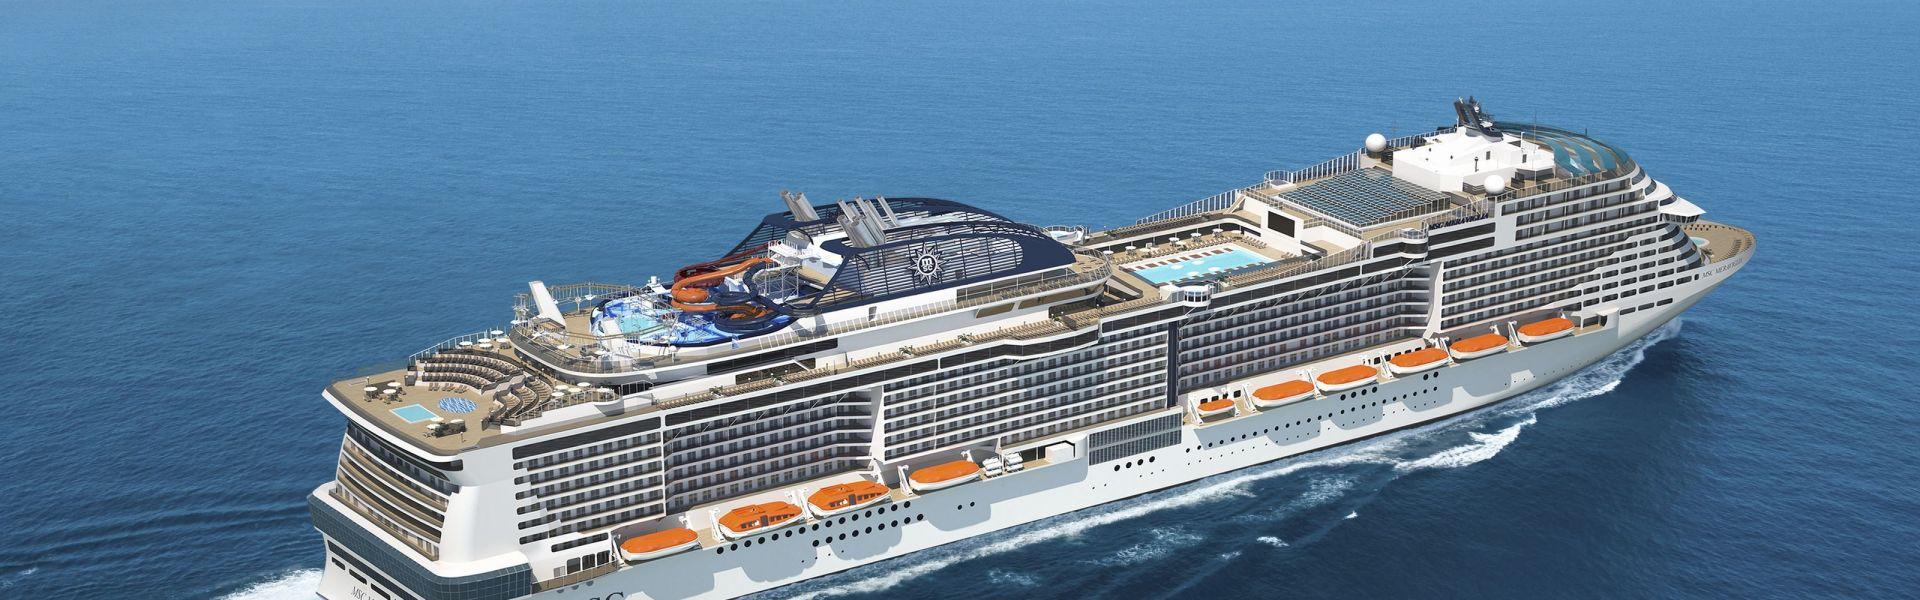 Croaziera 2018 - Europa de Nord (Hamburg) - MSC Cruises - MSC Meraviglia - 11 nopti